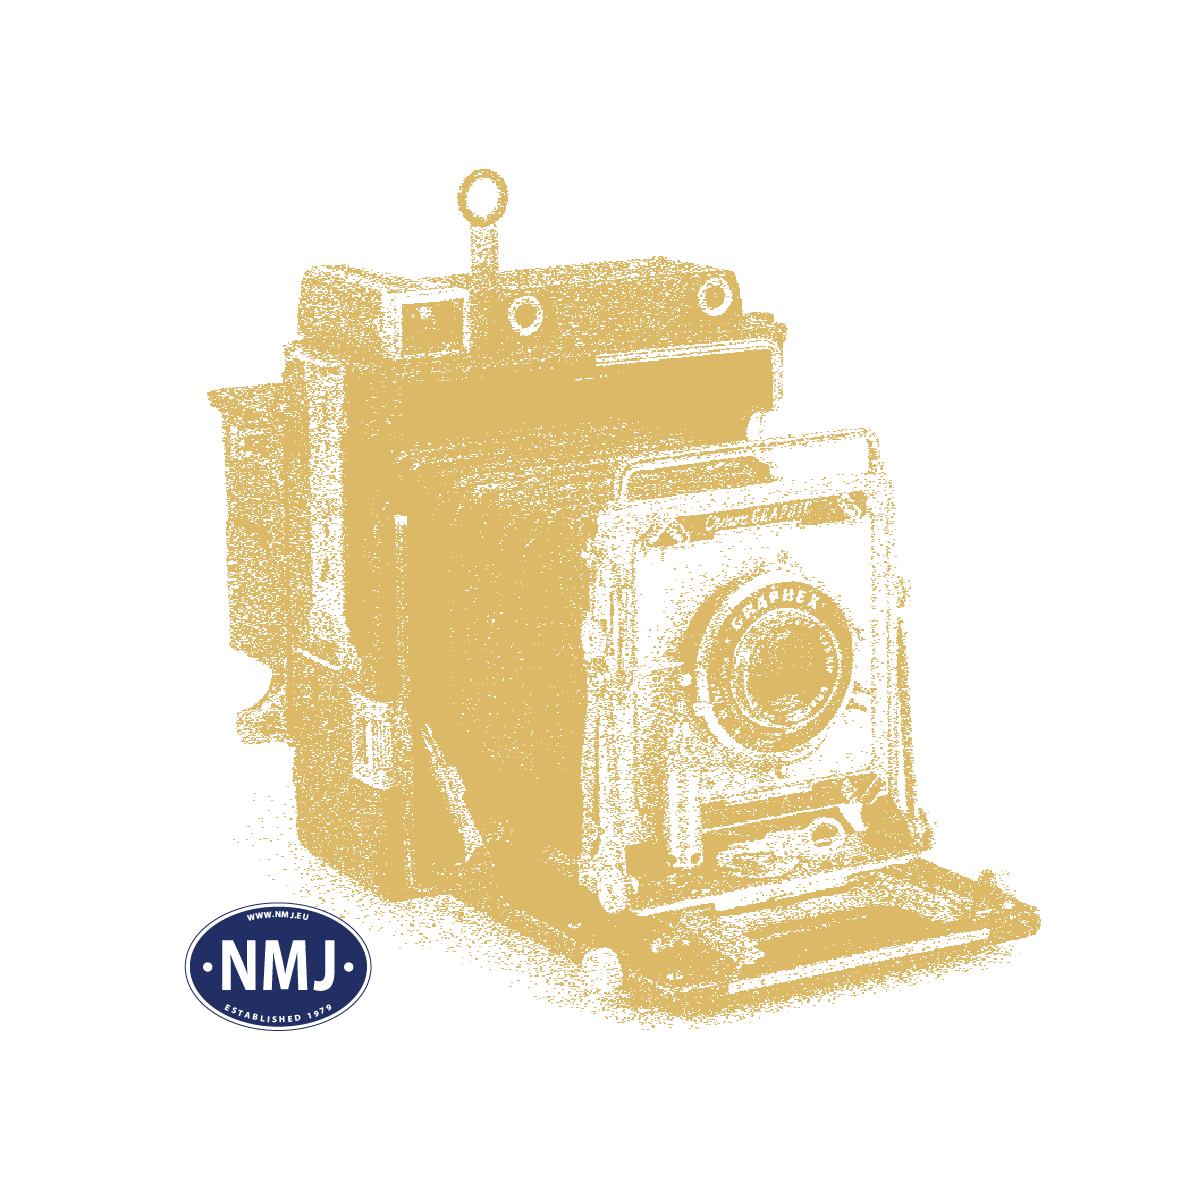 TAM74061 - Non-Scratch Pliers, Pumpetang